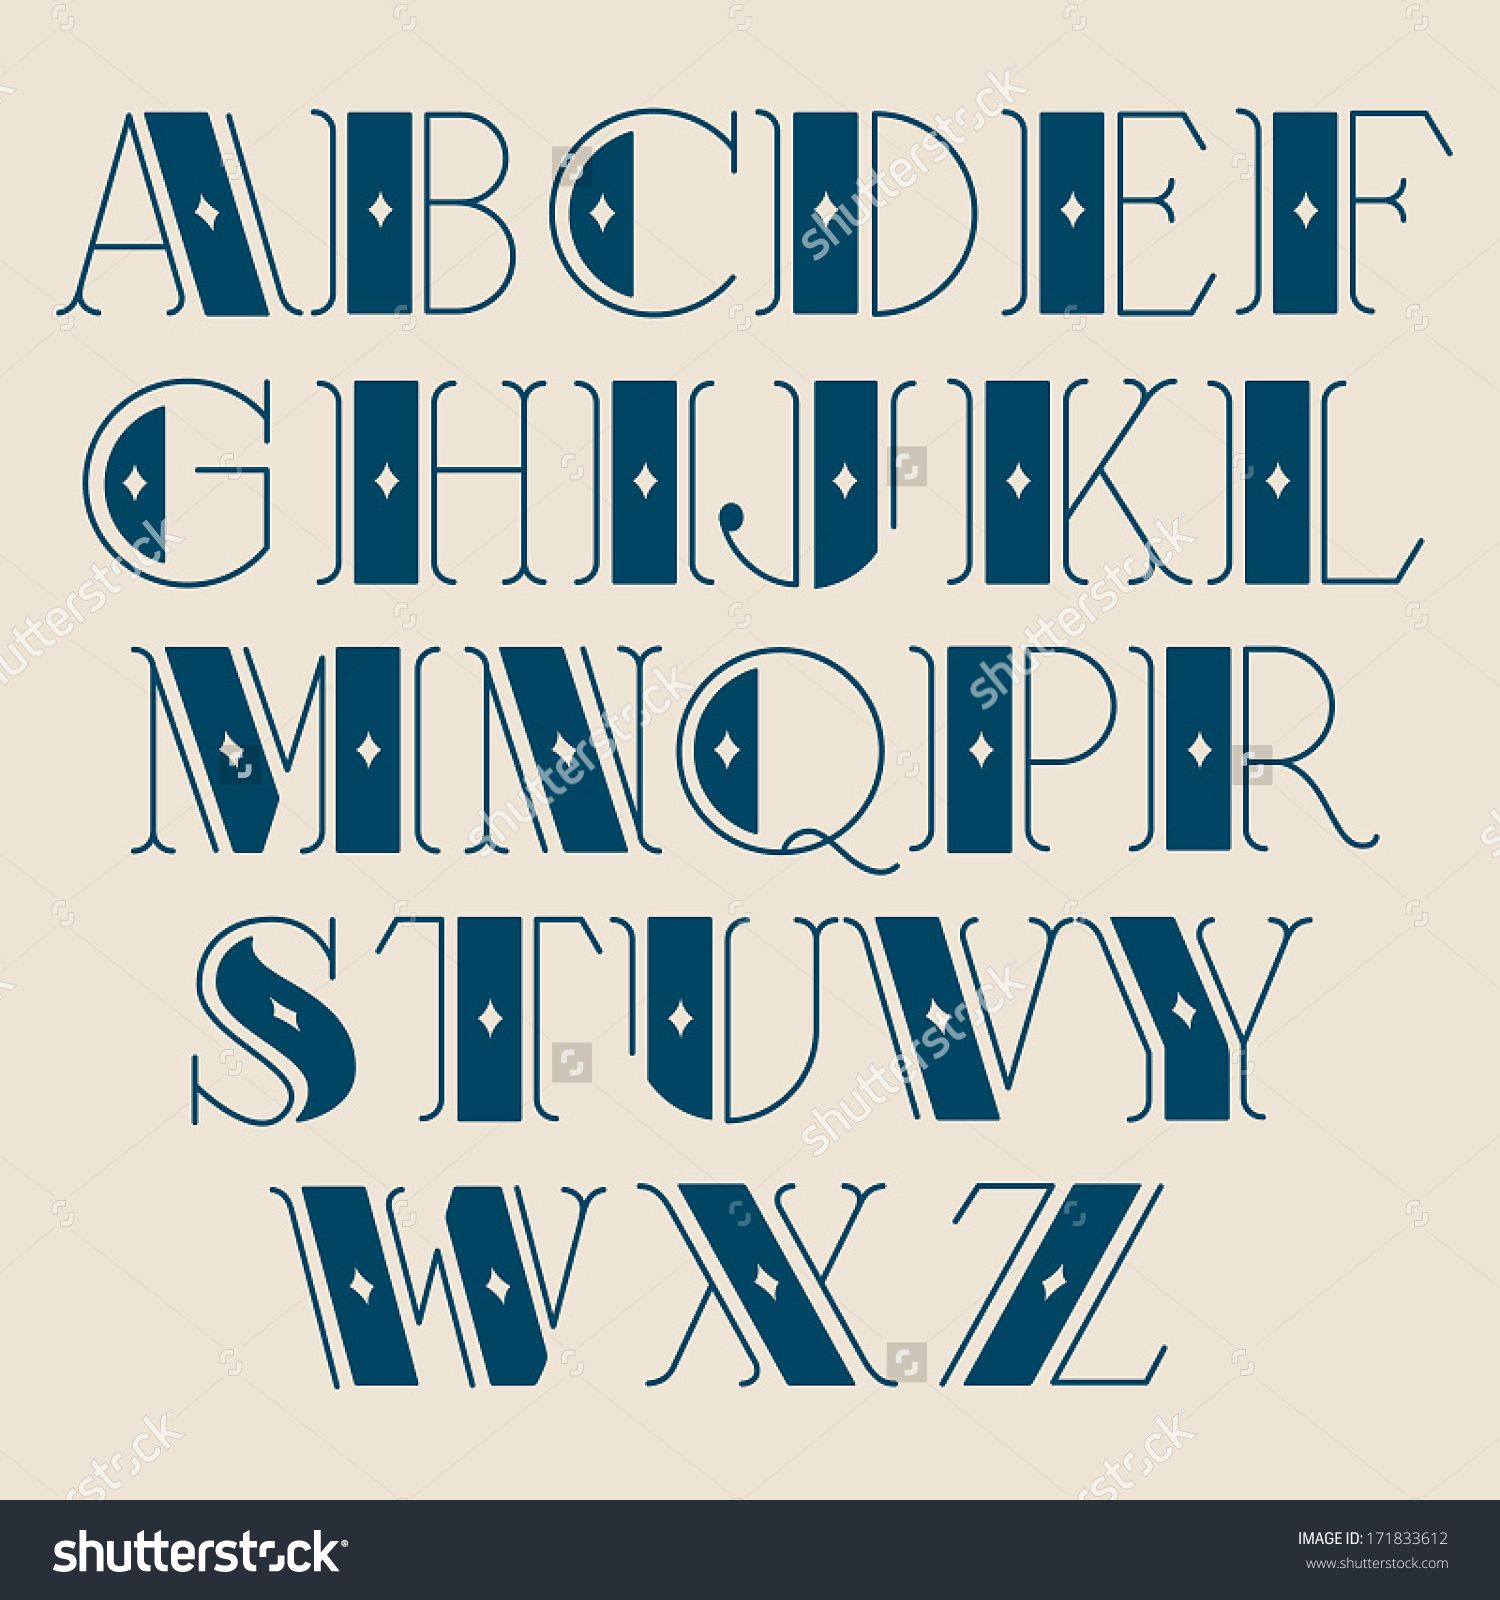 Font Design Alphabet Images Galleries